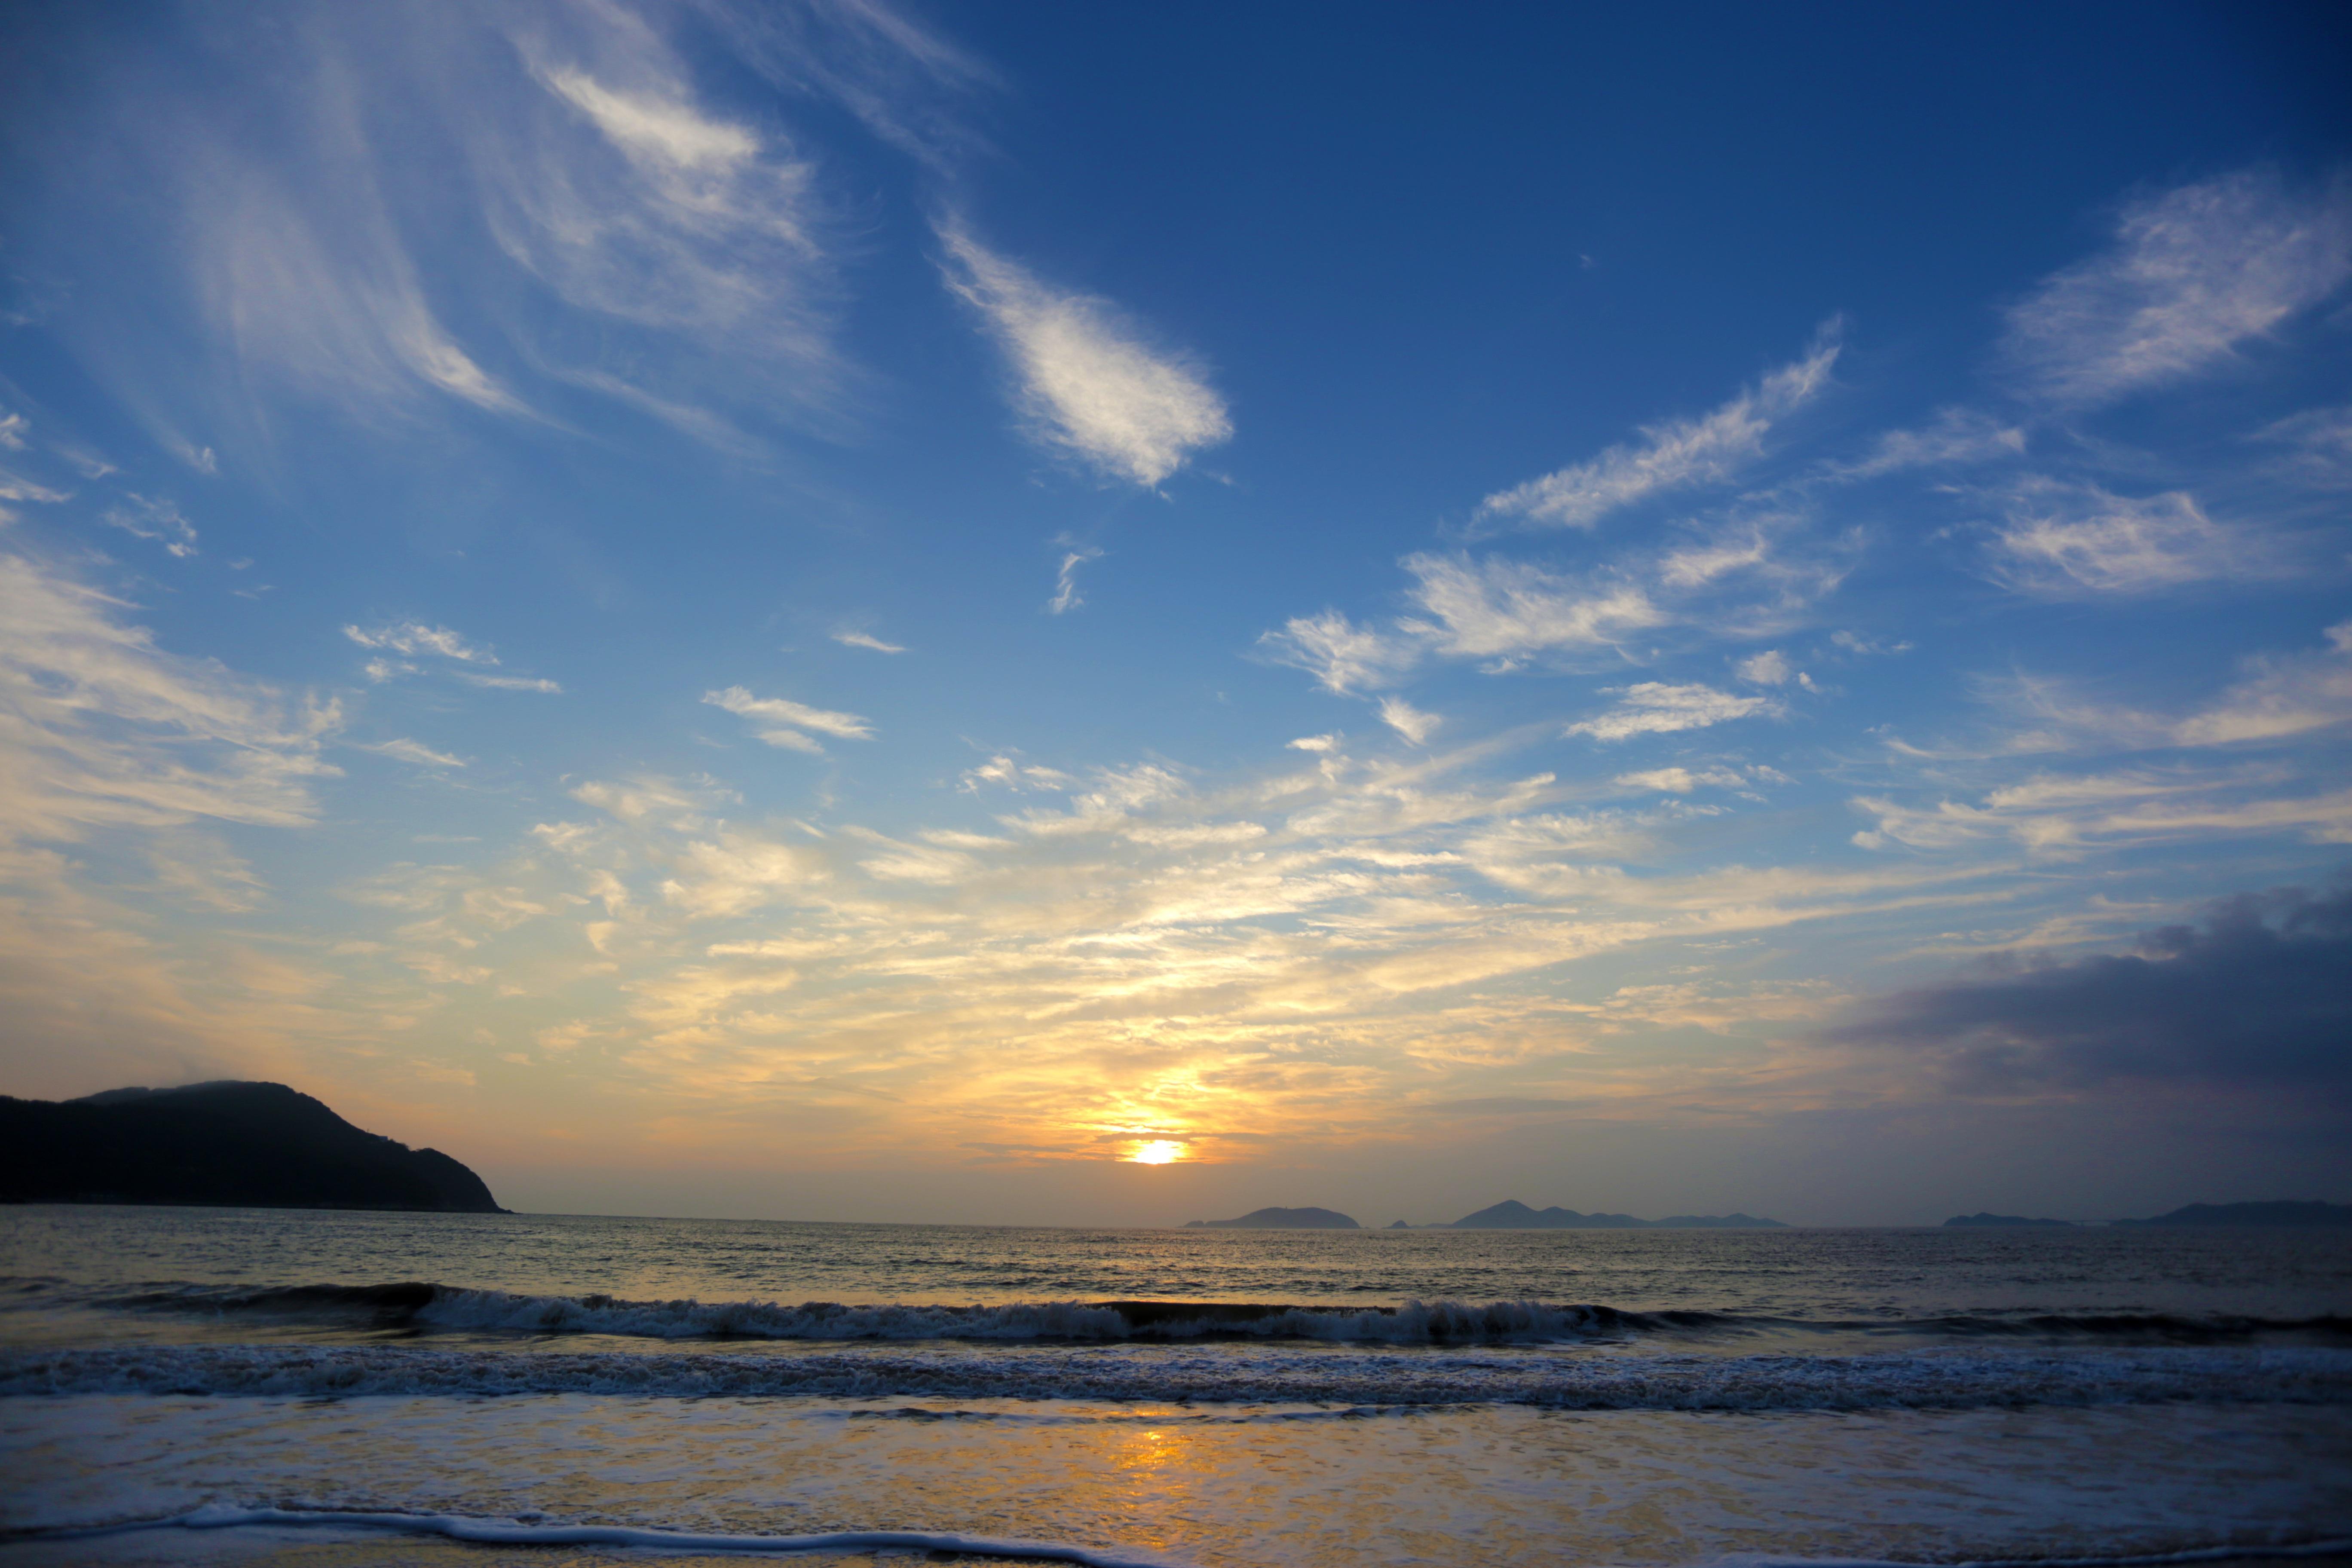 Free Images : Beach, Sea, Coast, Ocean, Horizon, Cloud